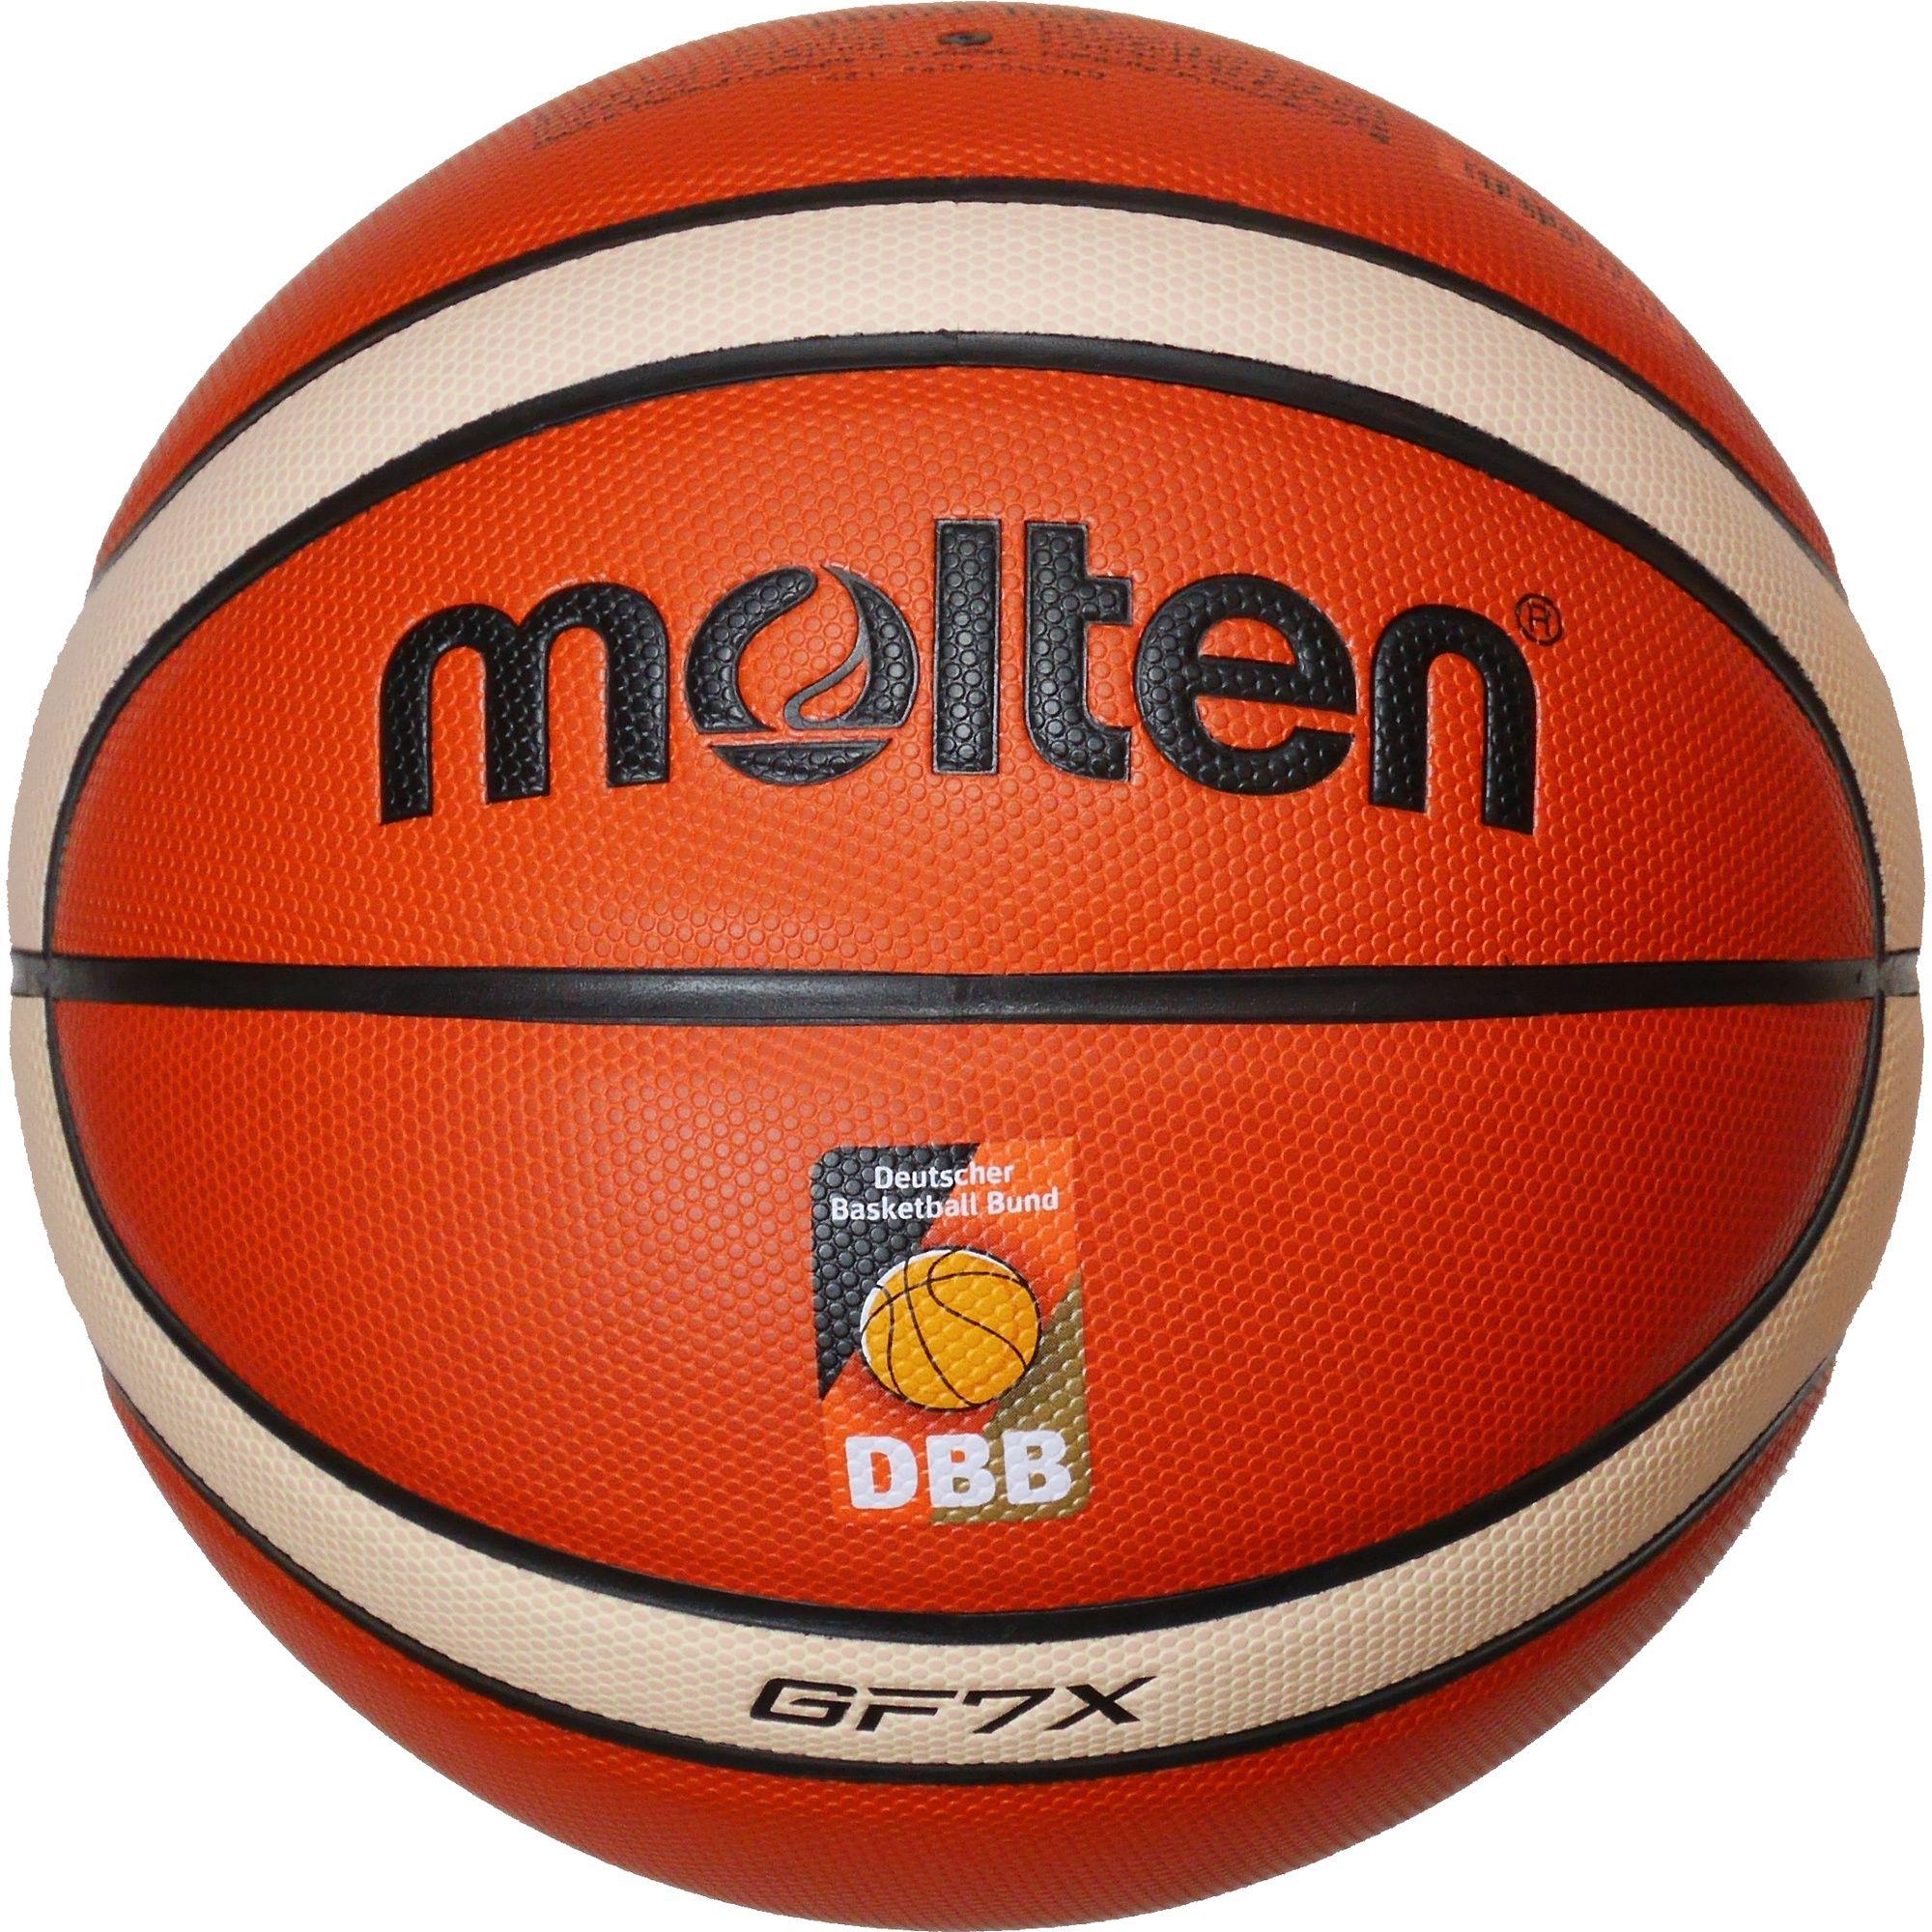 MOLTEN Molten BGF7X DBB Basketball